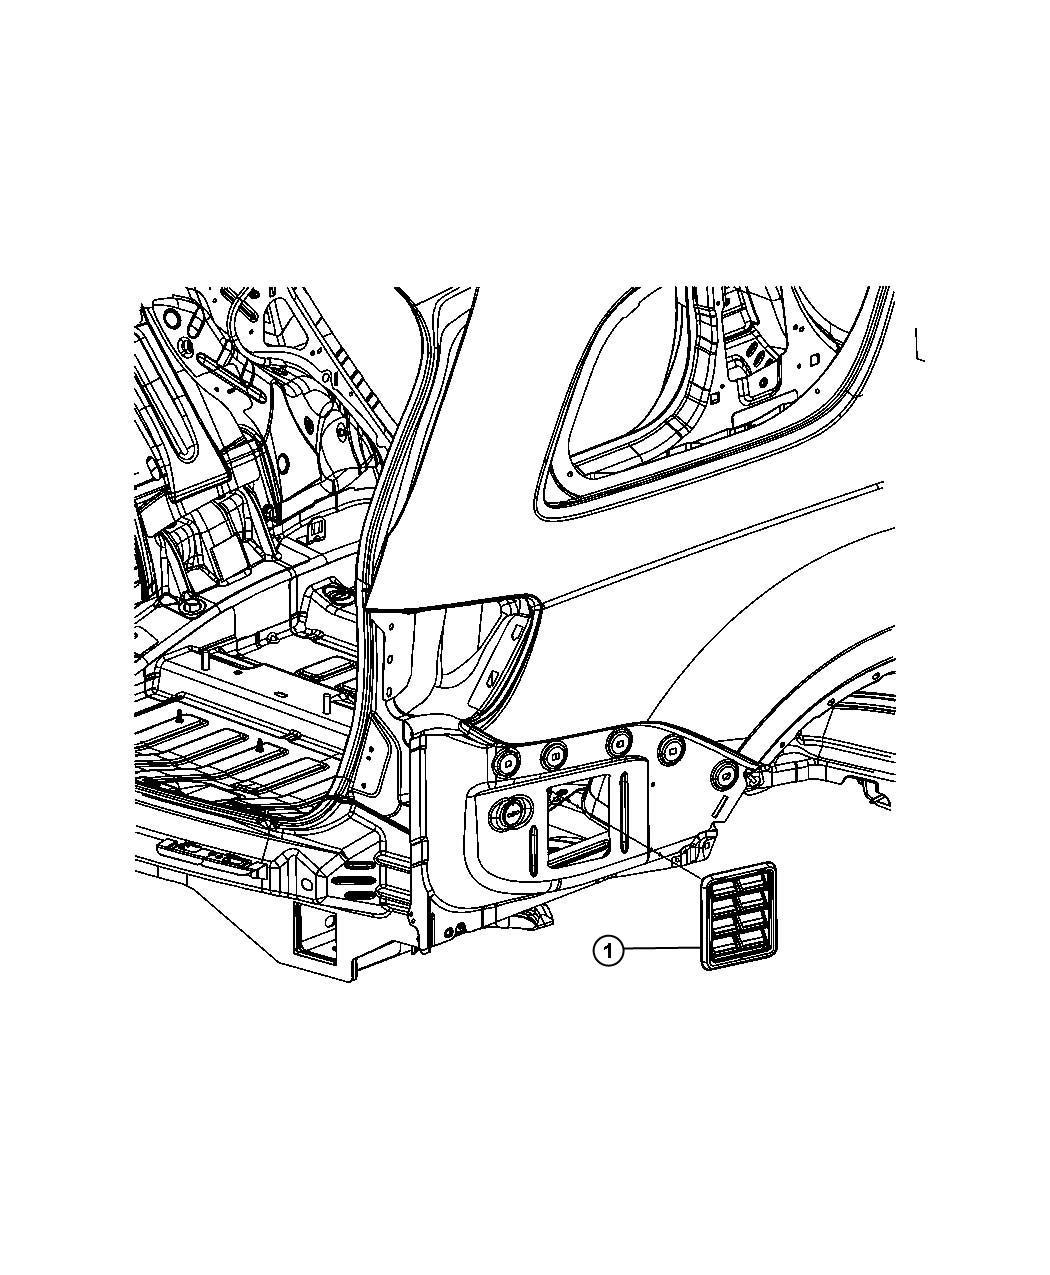 Jeep Grand Cherokee Exhauster. Quarter panel. Rear, body